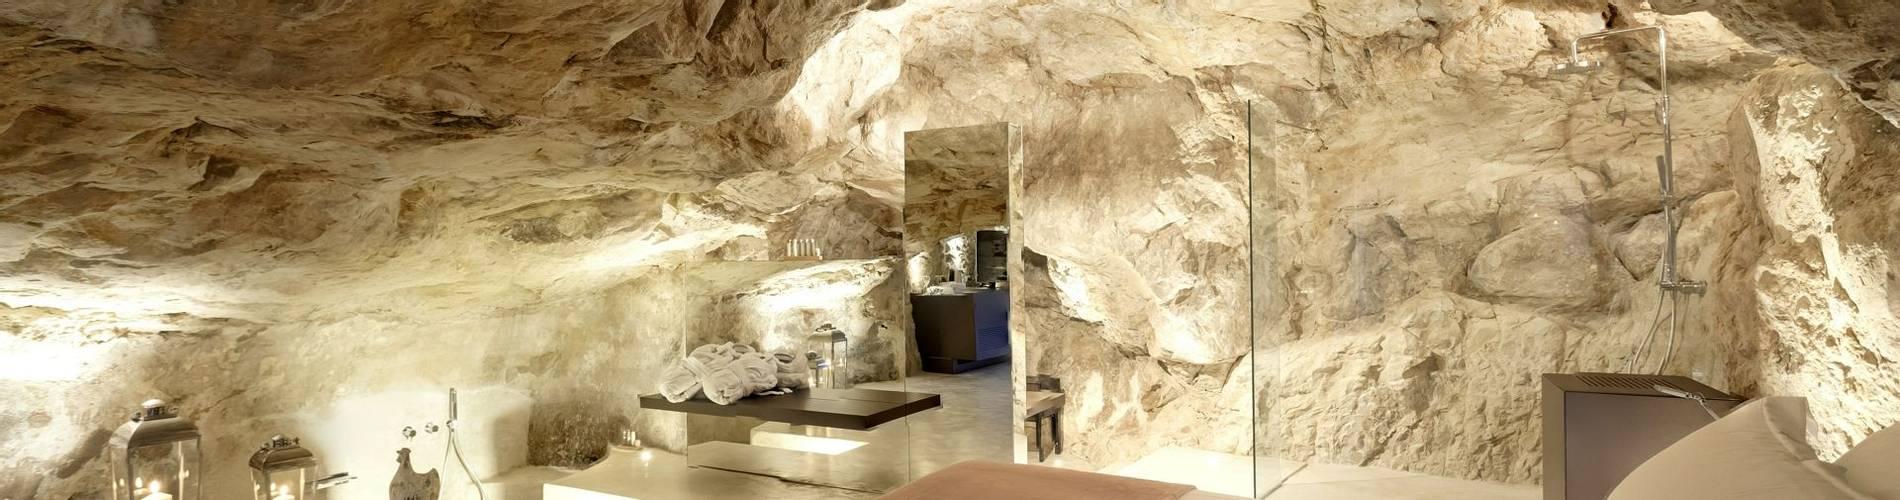 Locanda Don Serafino, Sicily, Italy, Luxury Suite (8).jpg